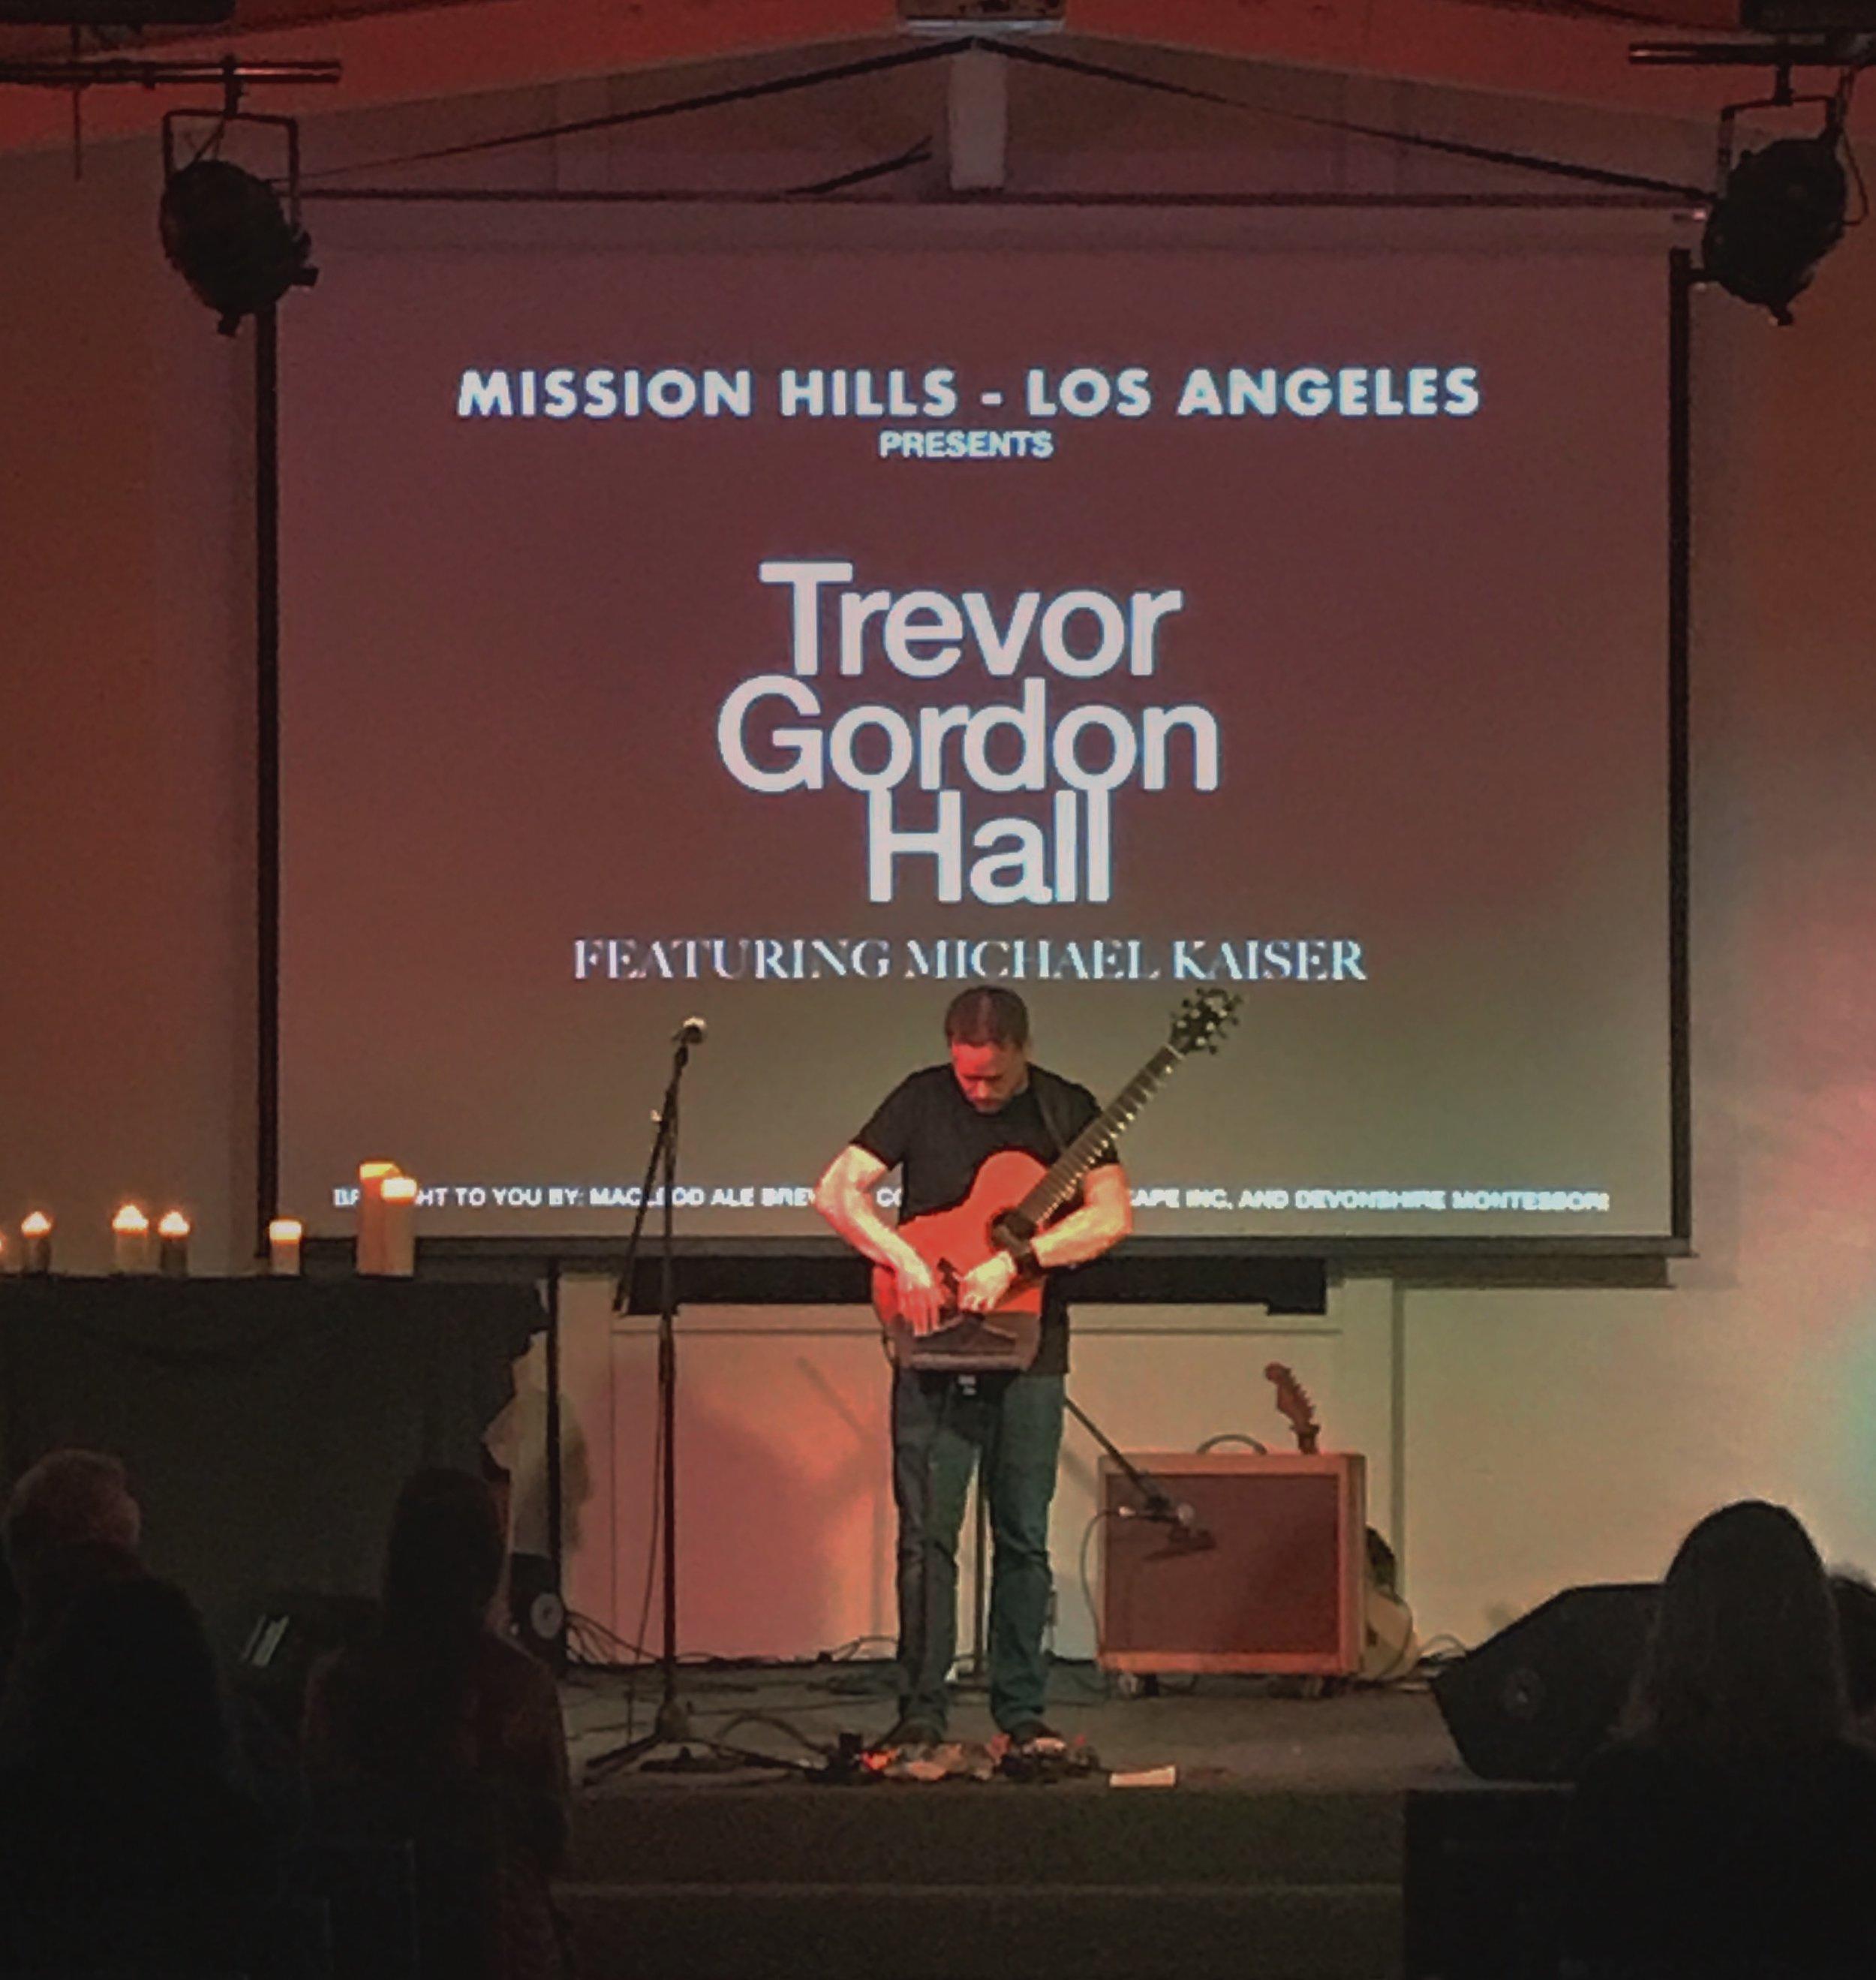 trevor-gordon-hall-mission-hills-los-angeles-free-concert.jpg